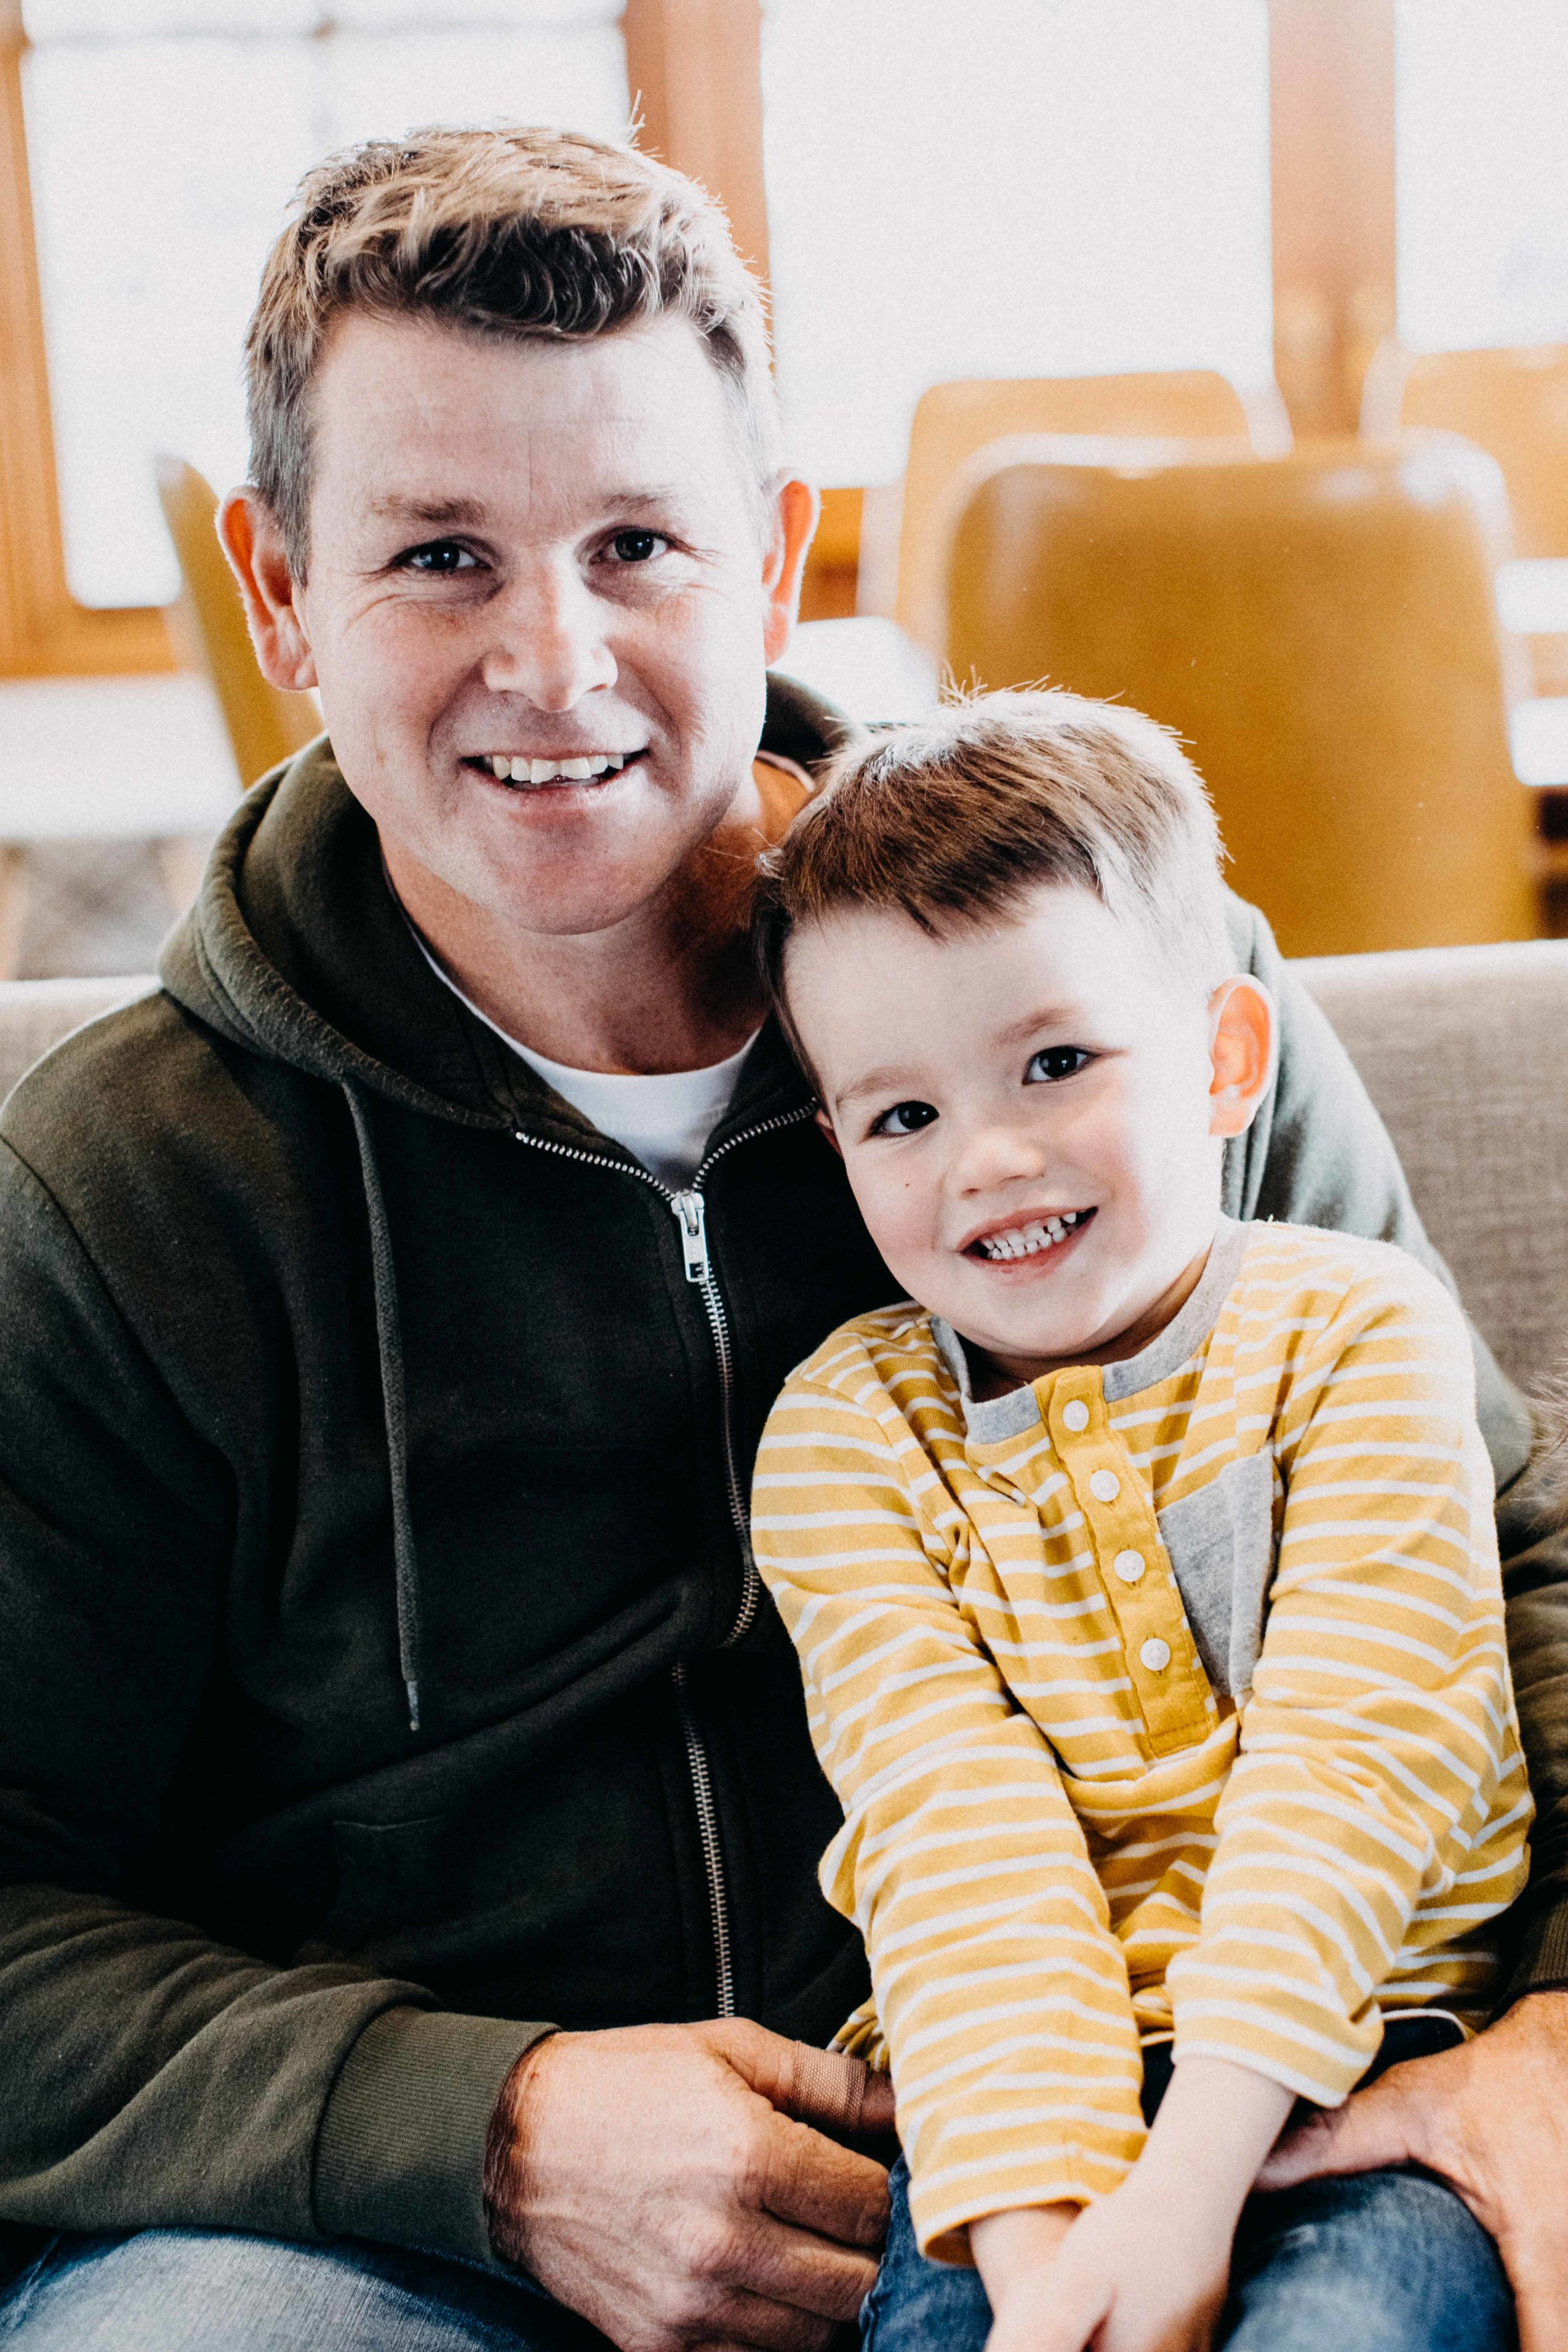 poppy-newborn-the-oaks-family-photographer-www.emilyobrienphotography.net-6.jpg